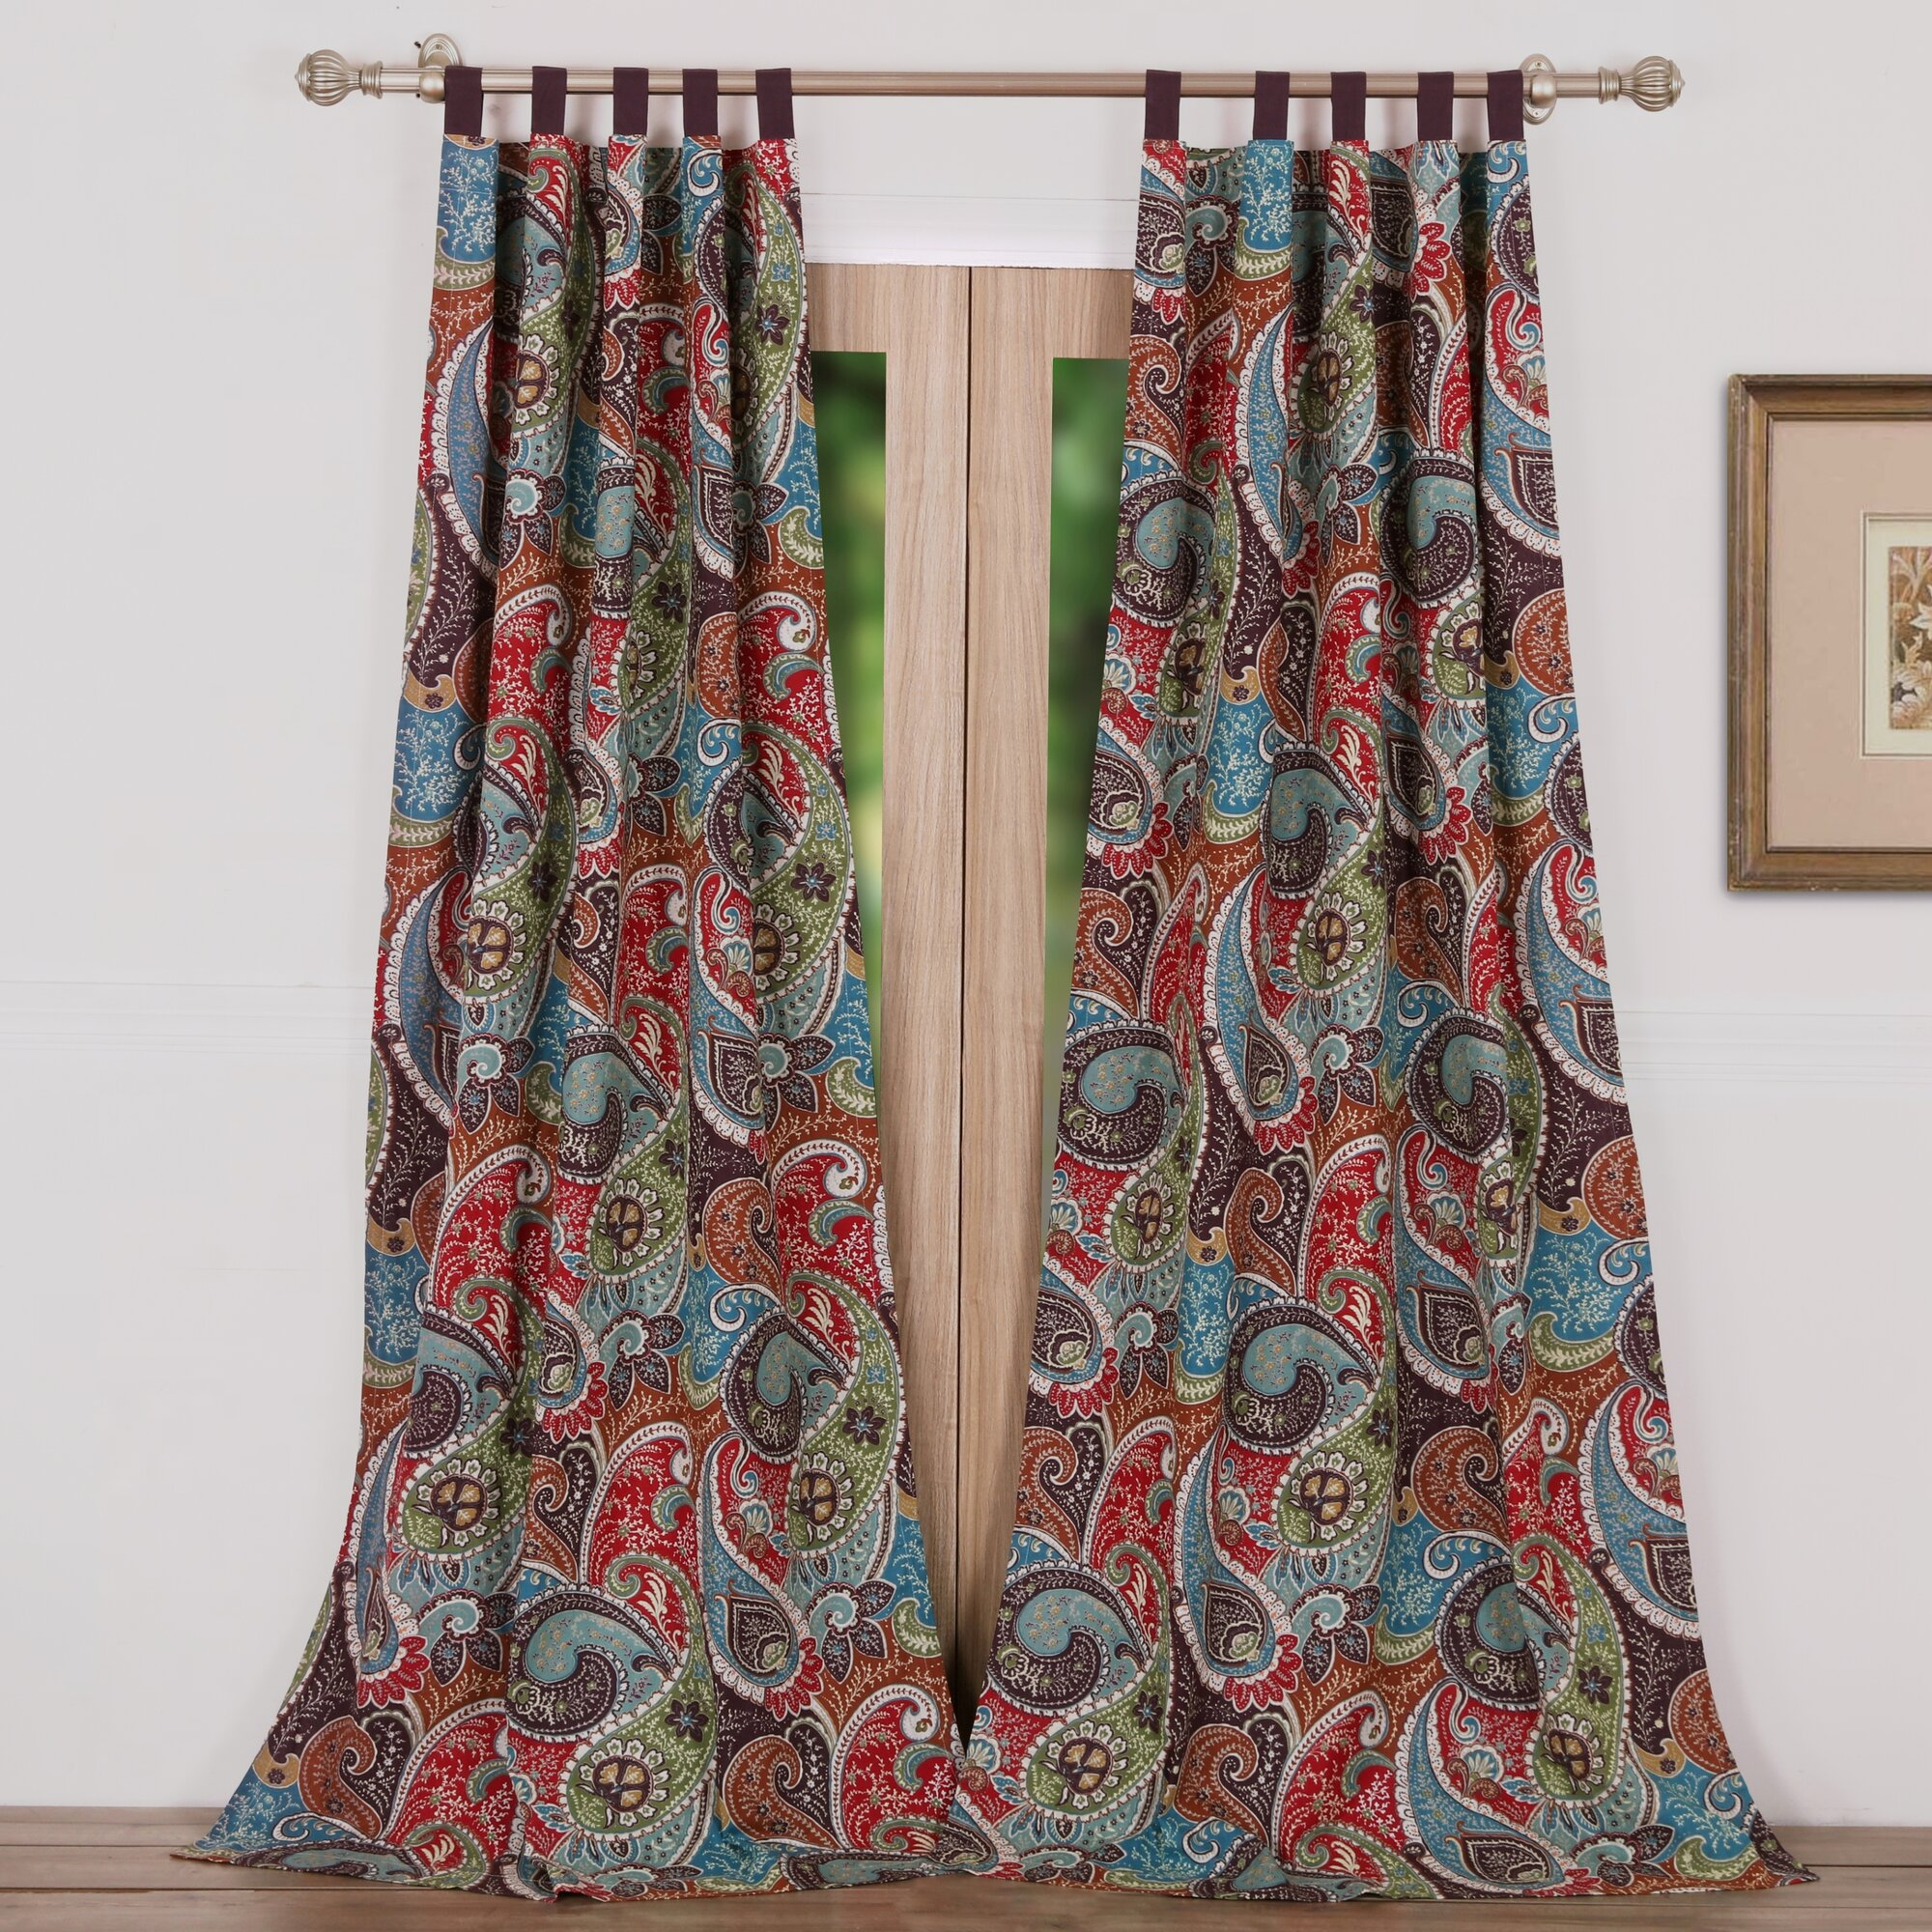 Greenland Home Fashions Tivoli Paisley Sheer Tab Top Curtain Panels Reviews